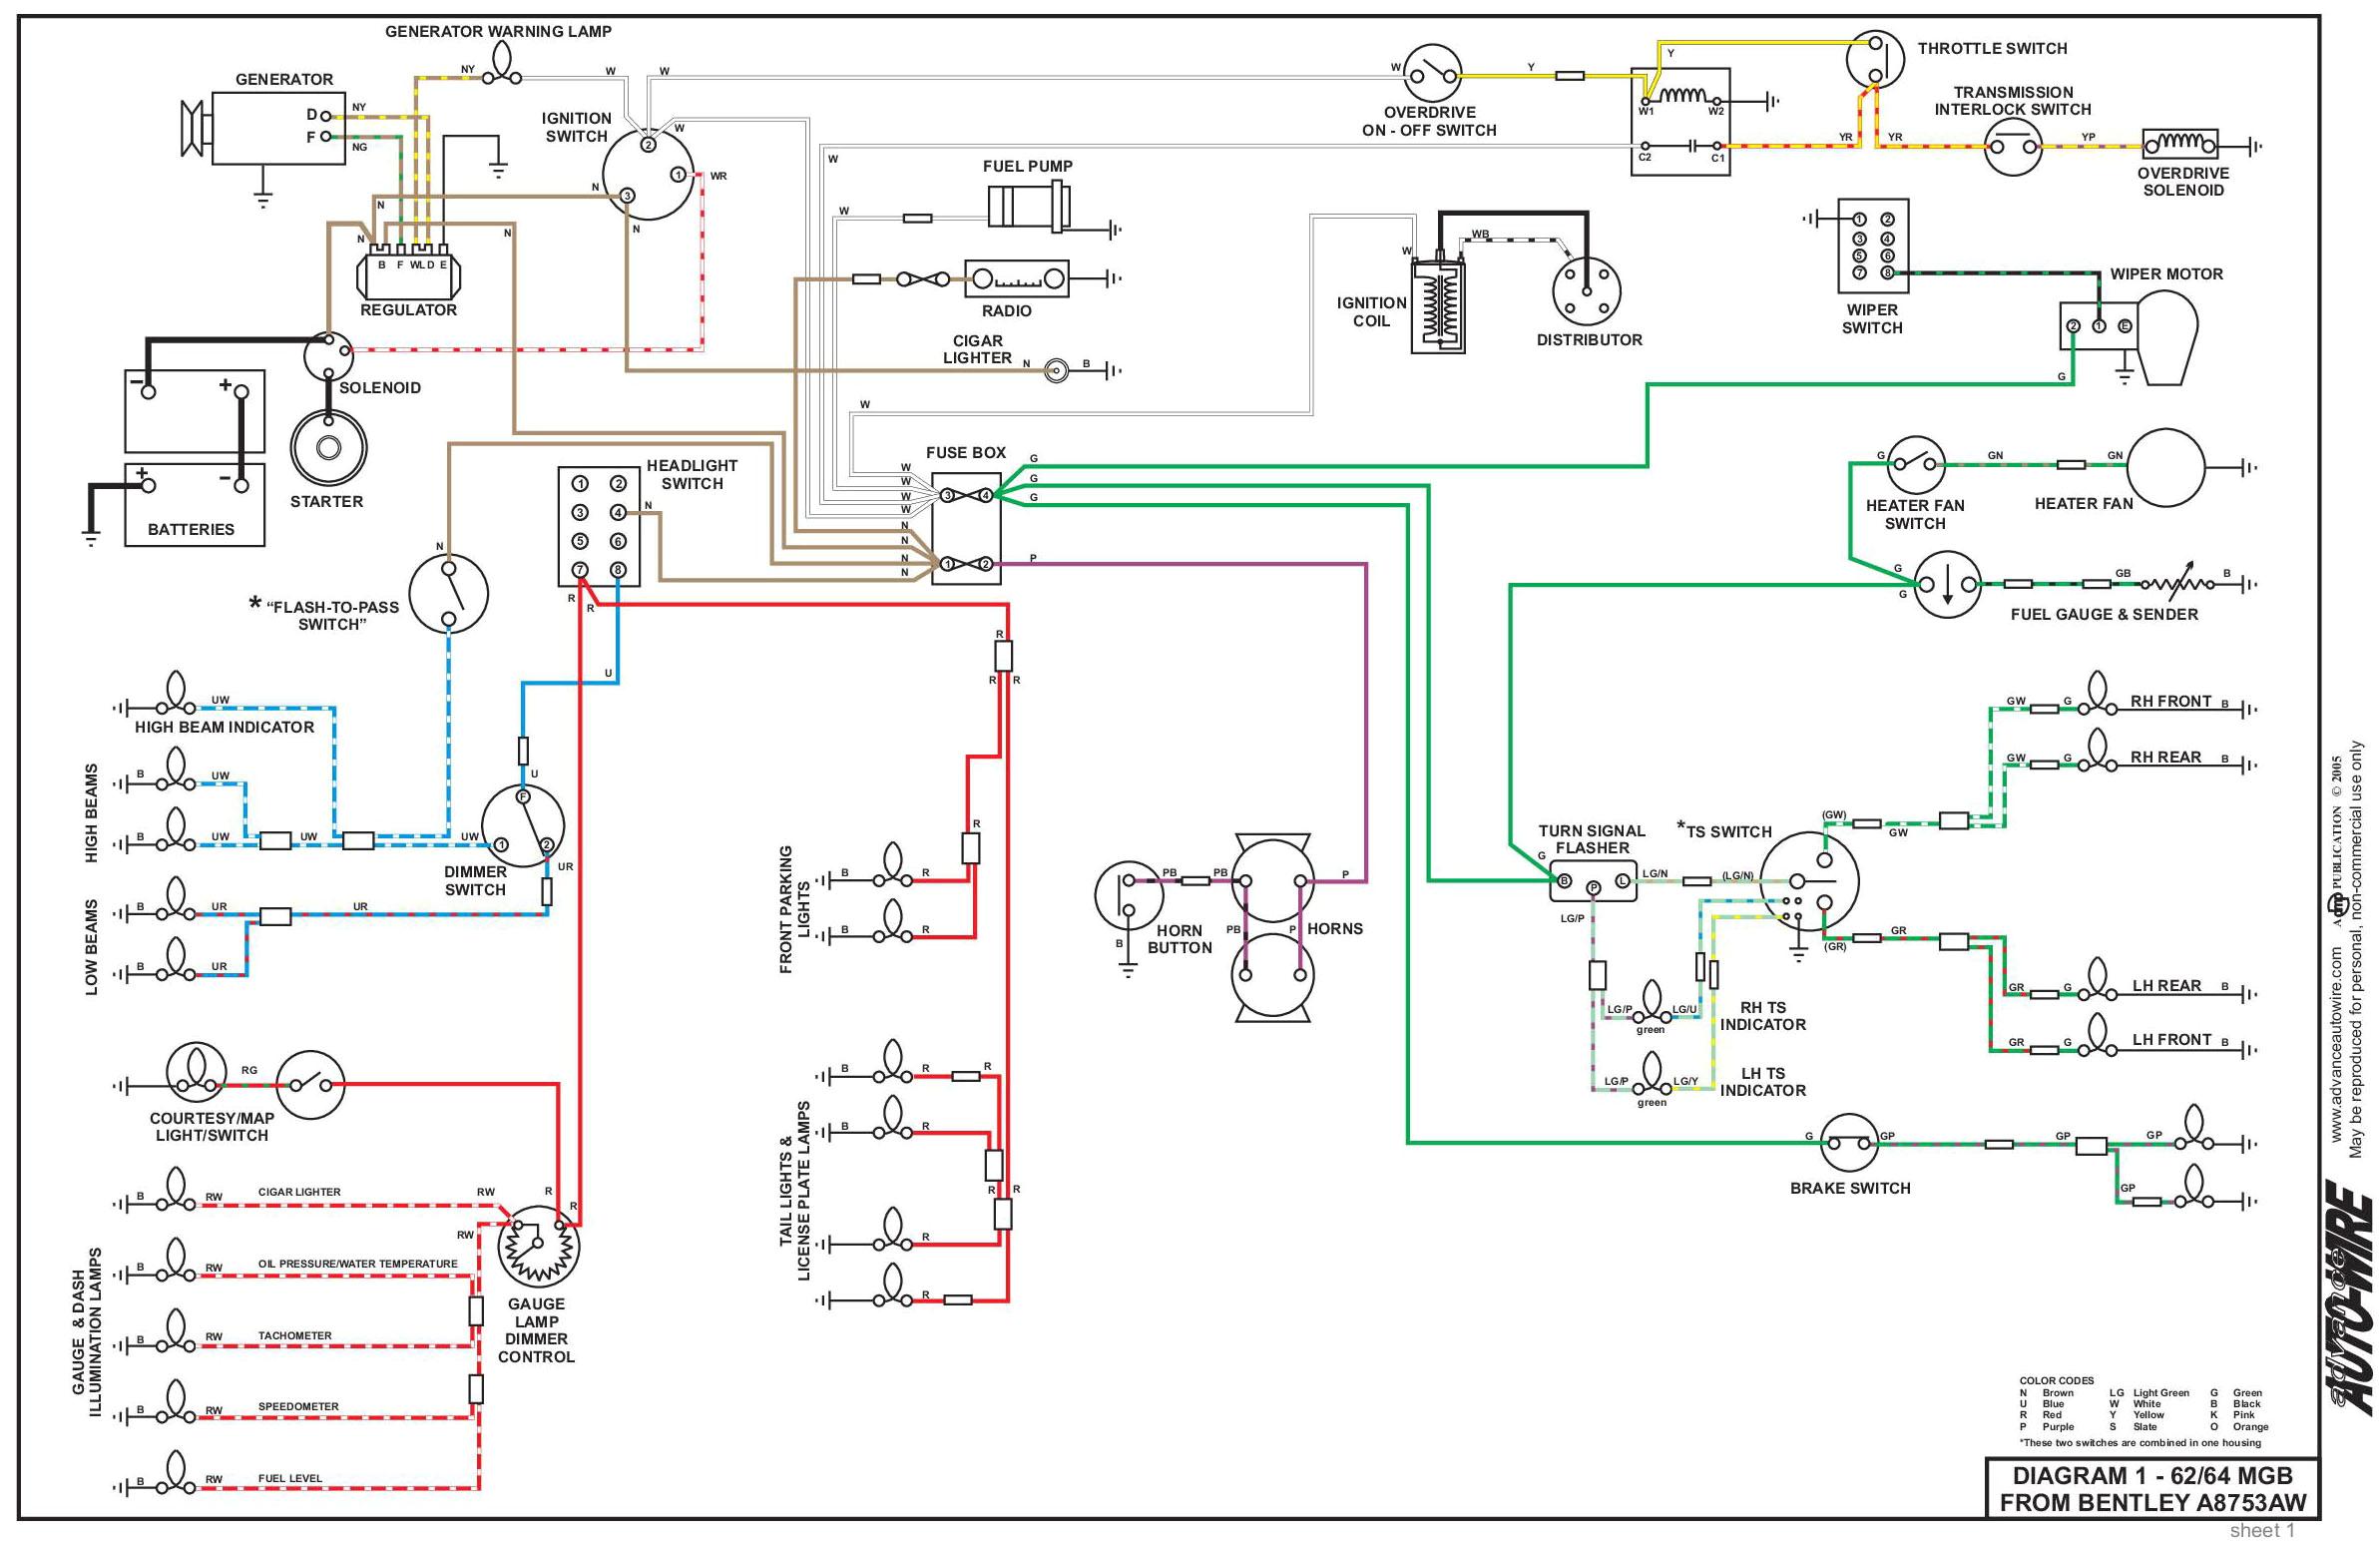 1973 mg mgb wiring diagram wiring diagram host 1973 mg mgb wiring diagram schematic